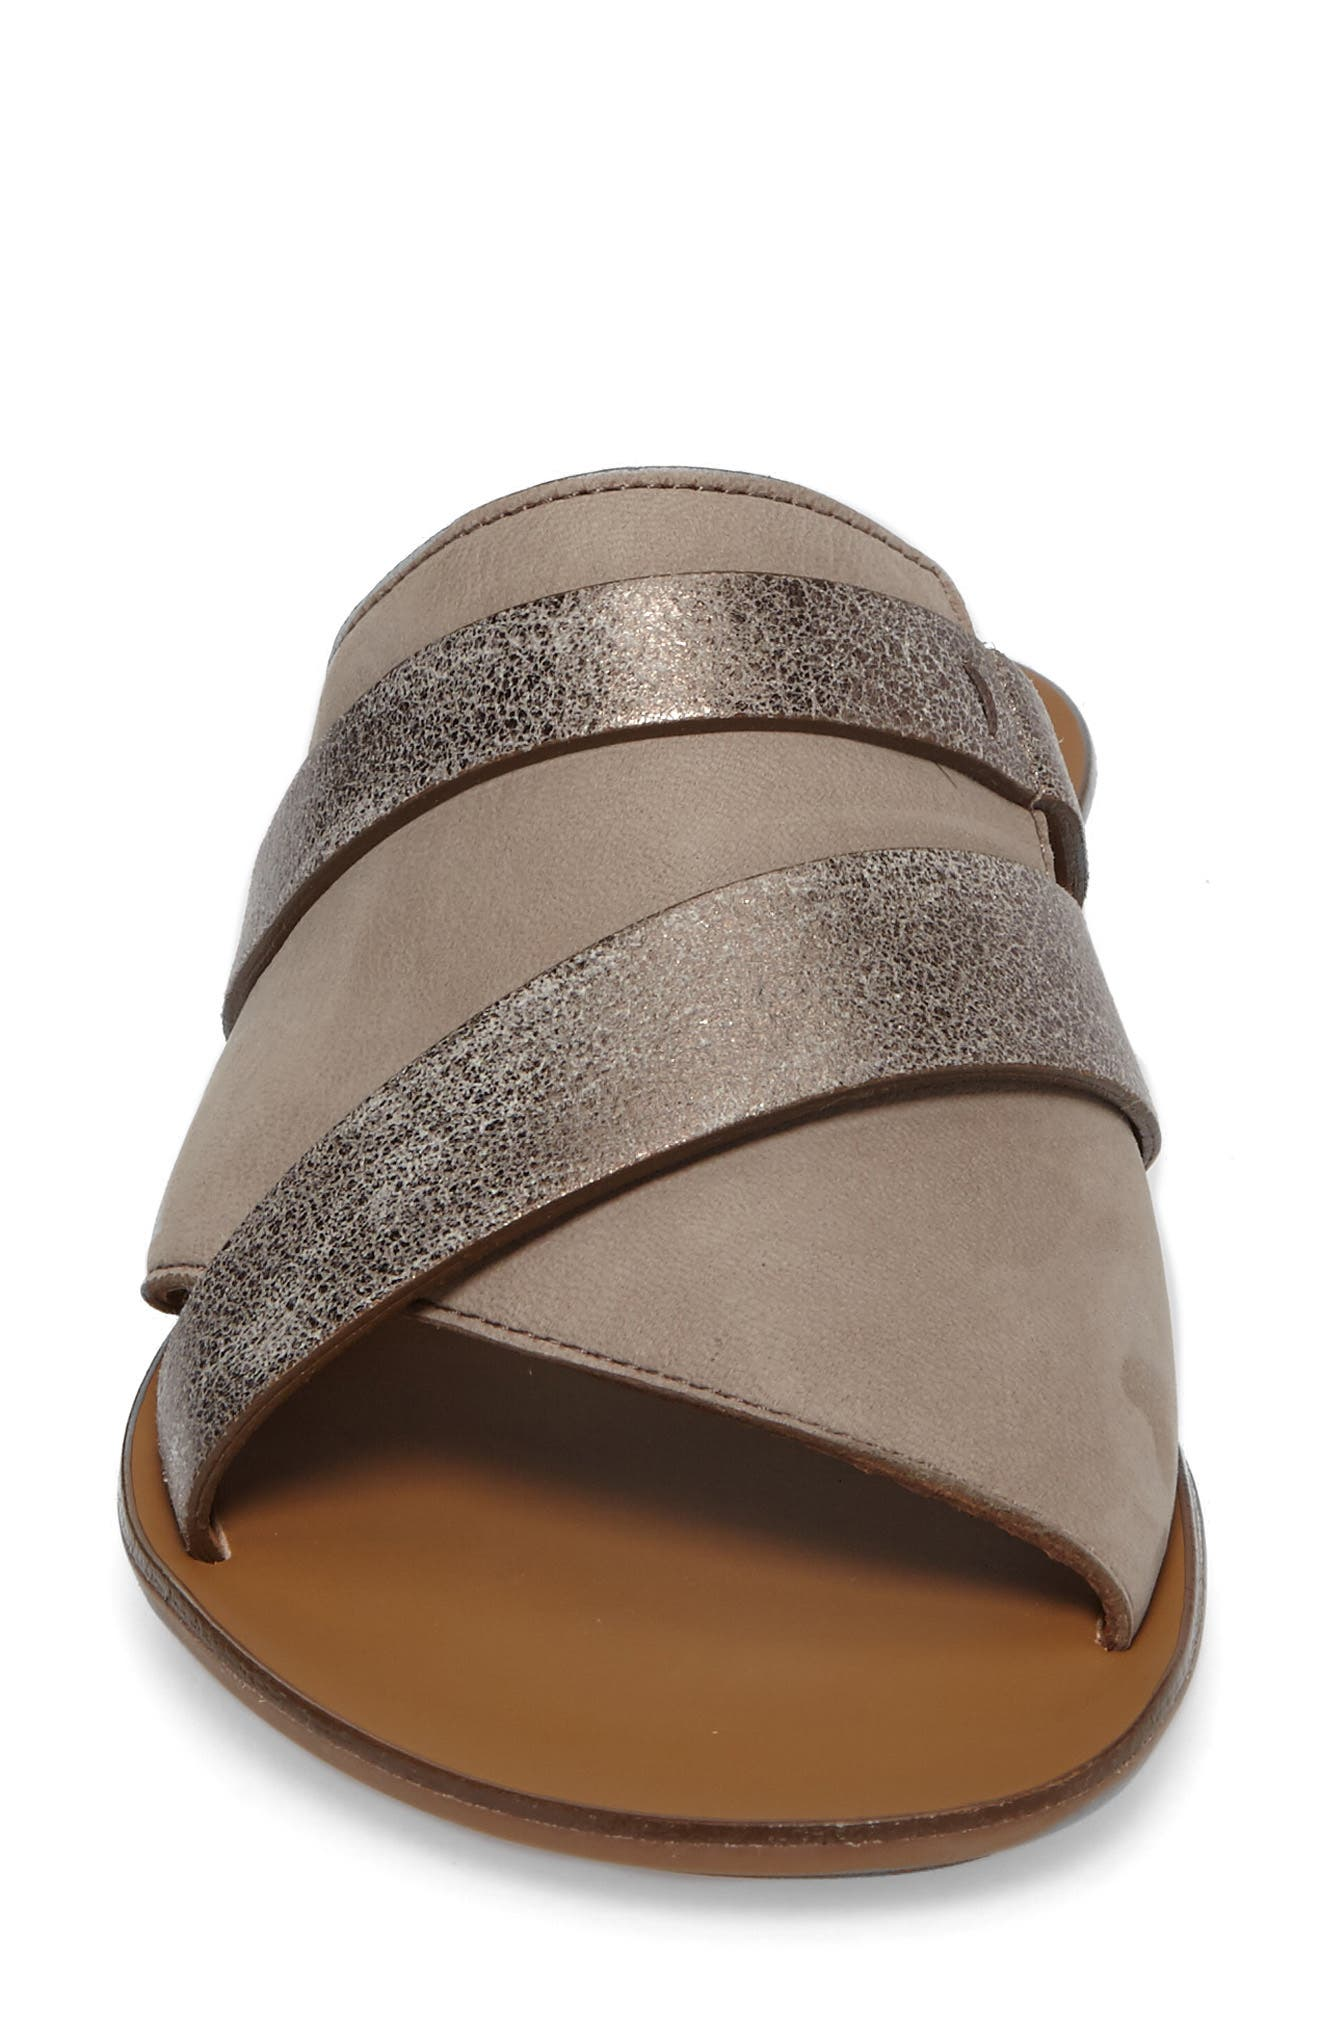 'Bayside' Leather Sandal,                             Alternate thumbnail 4, color,                             GREY